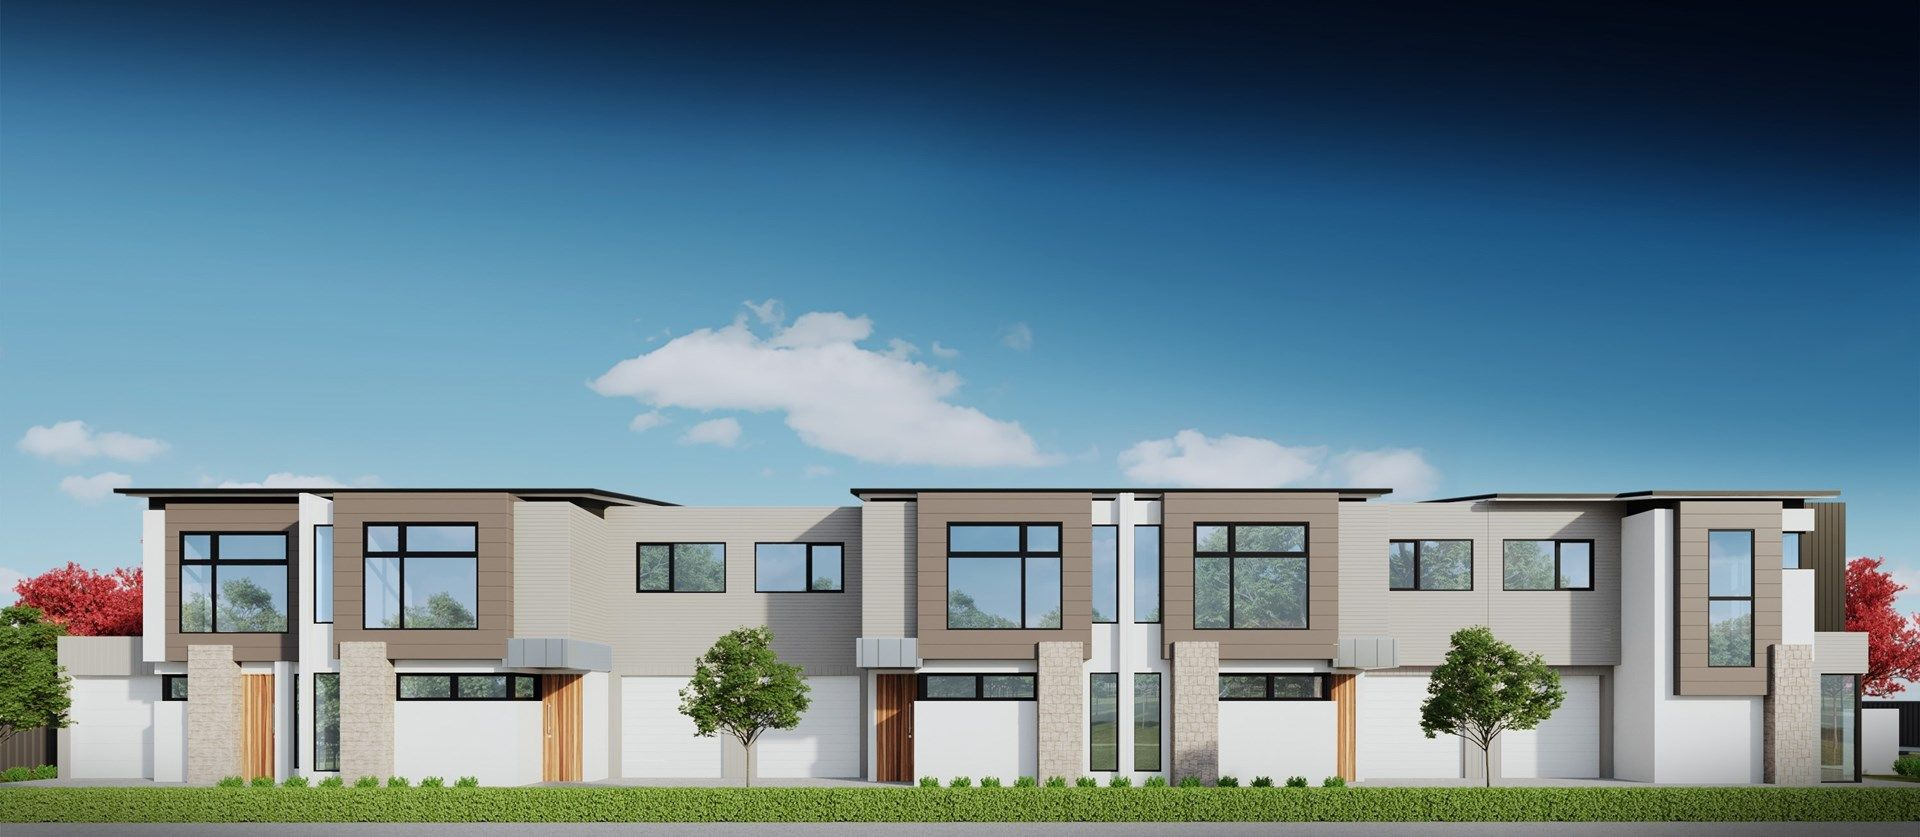 1/Lot 1 Ritchie Terrace, Marleston SA 5033, Image 1